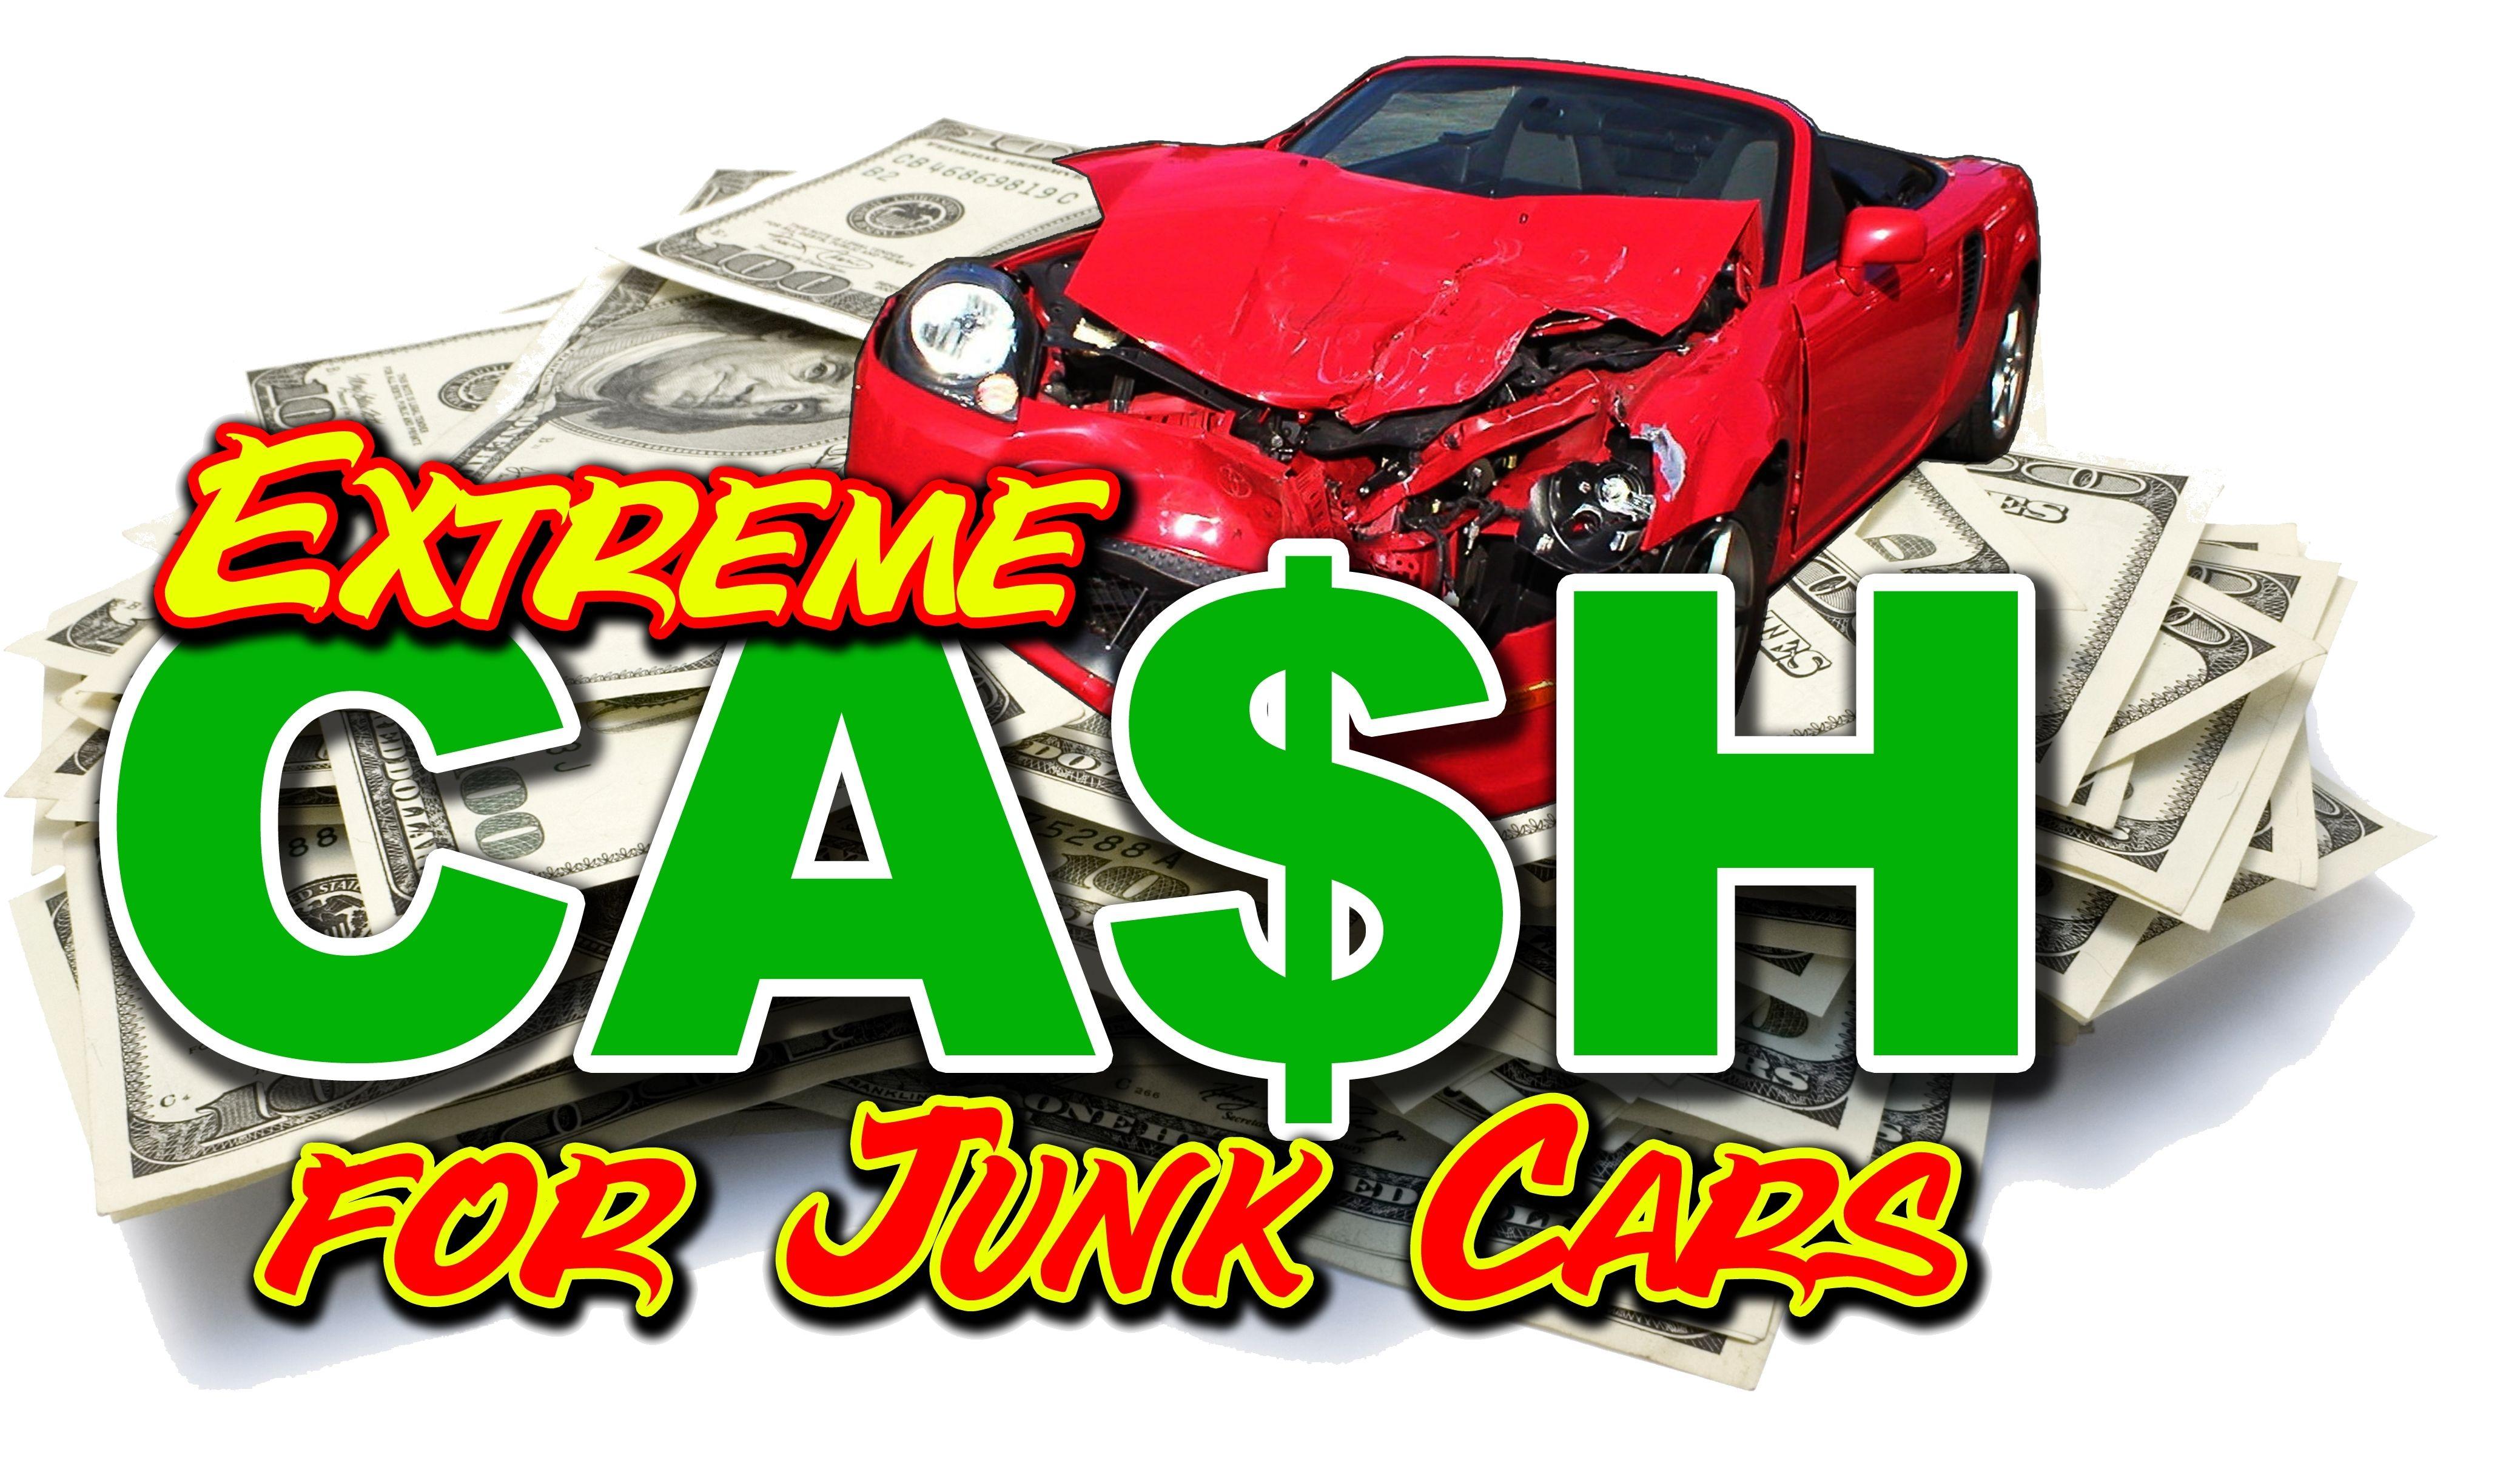 Junk Cars Bronx Provides Bronx Junk Car Removal